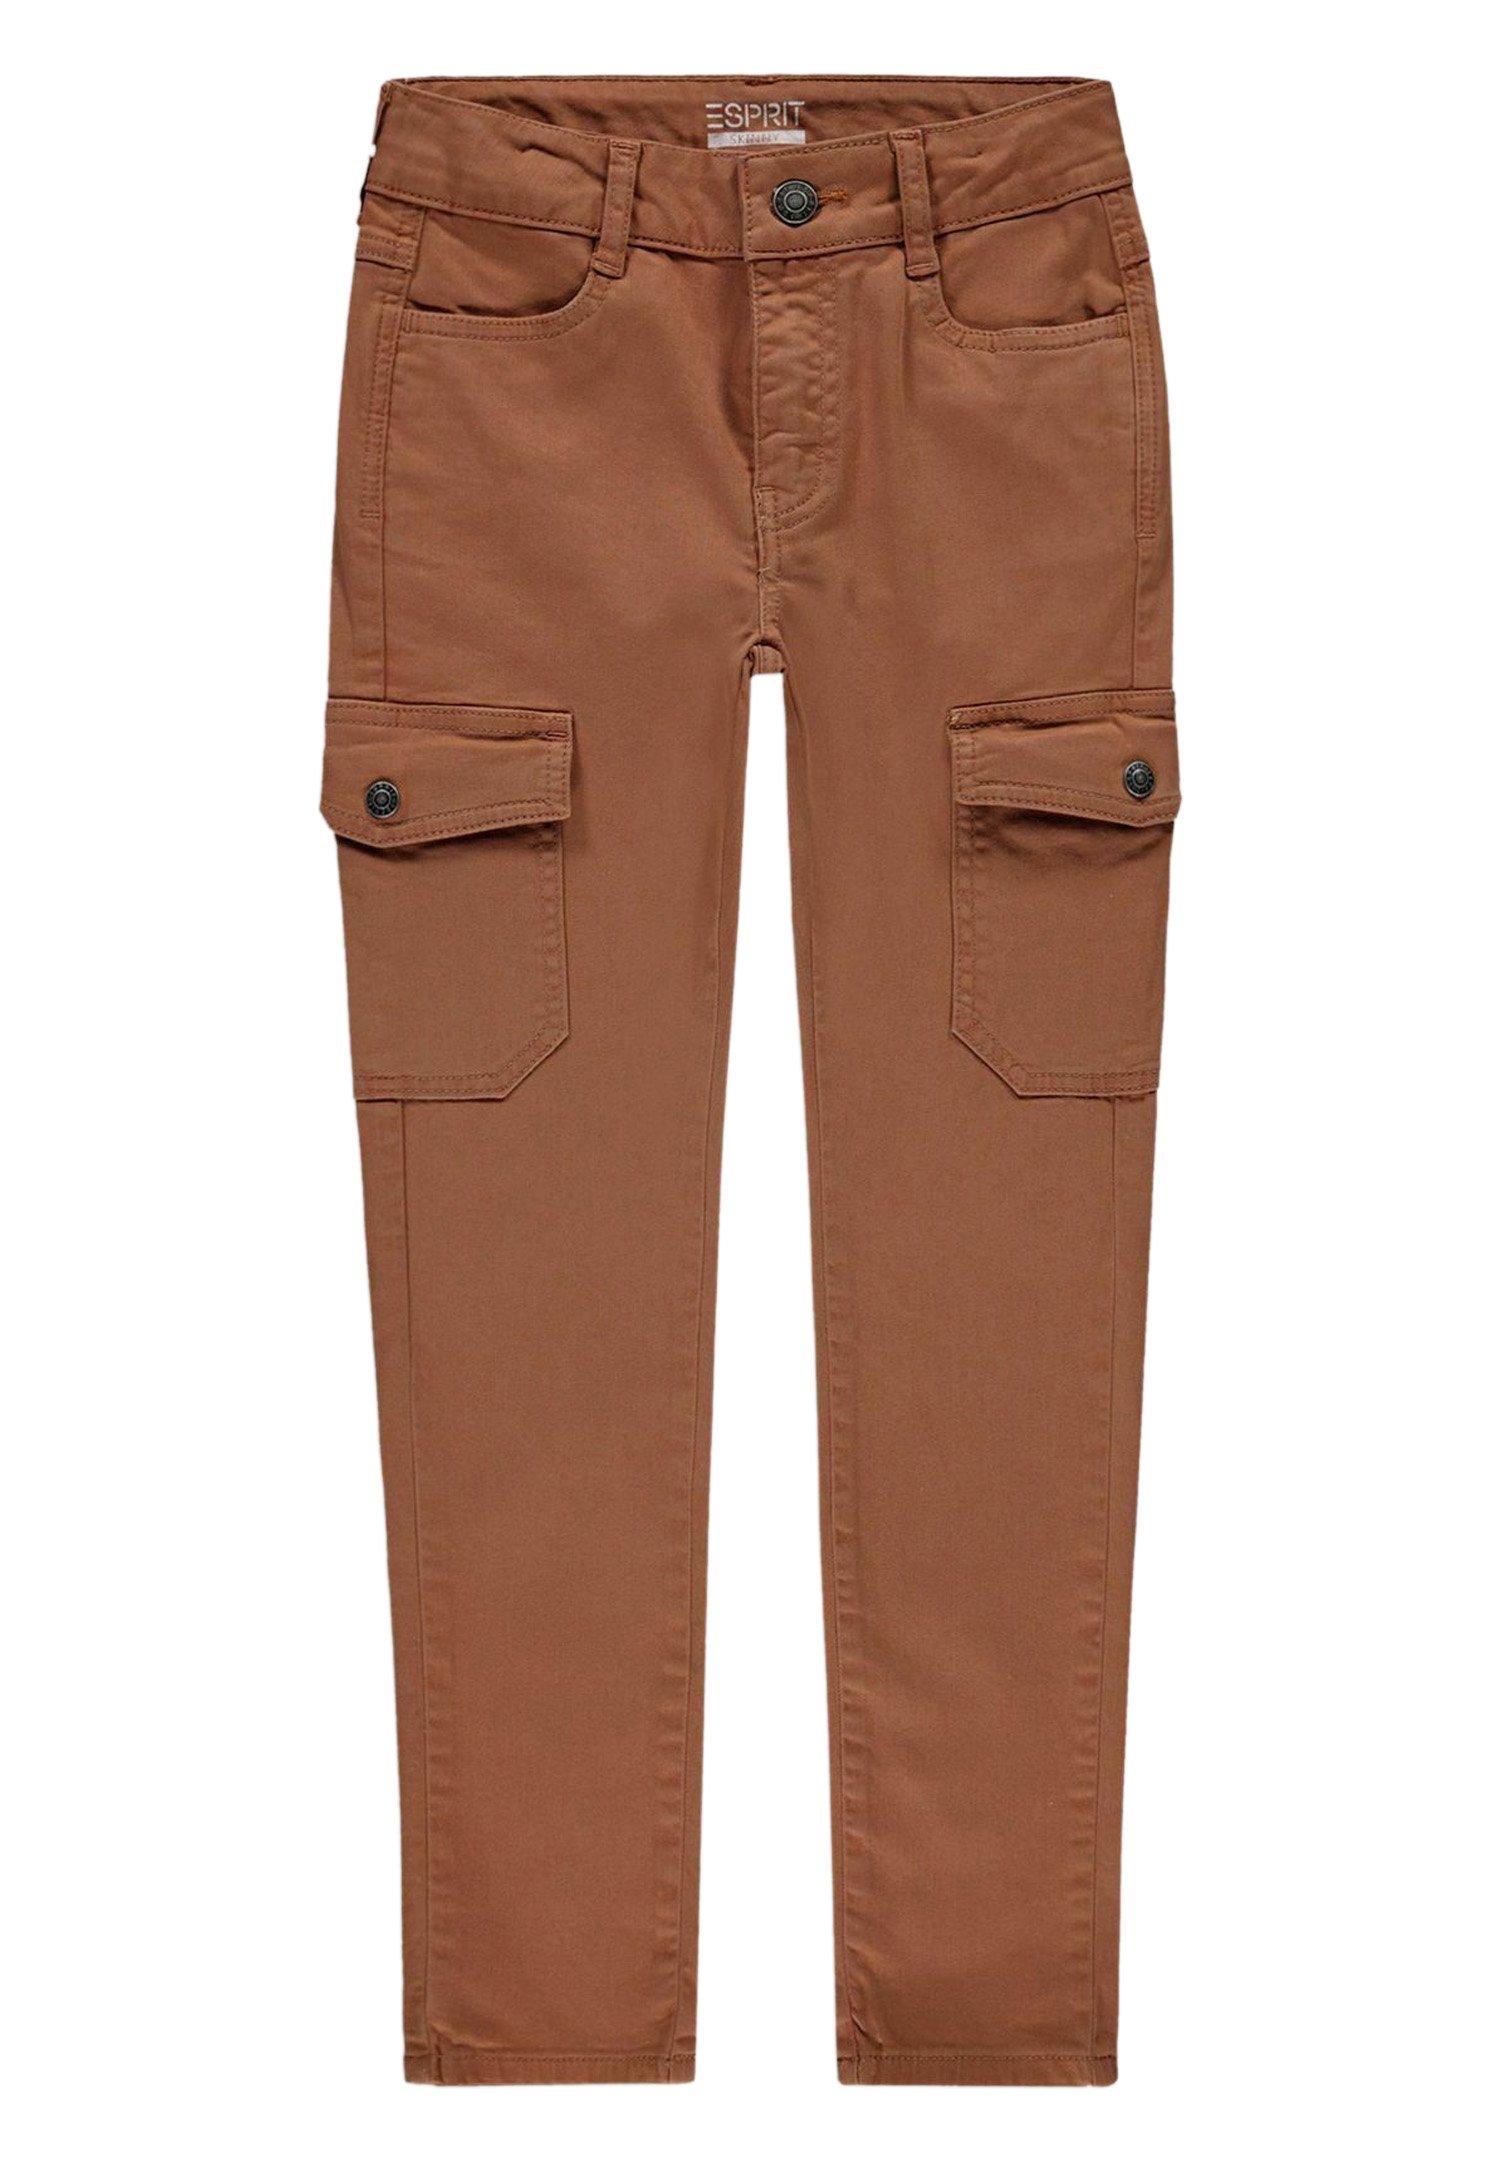 Enfant Pantalon cargo